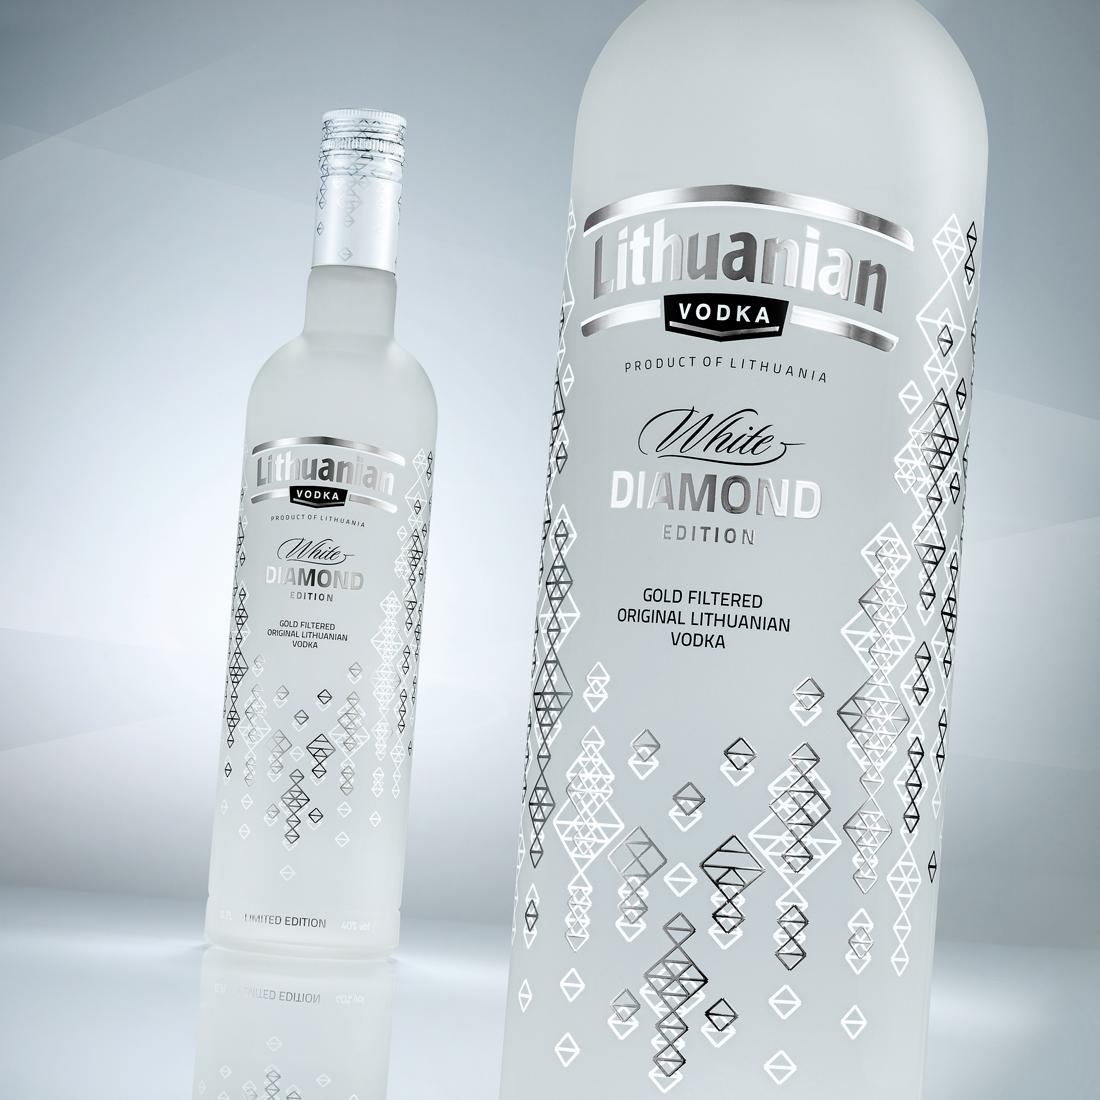 Lithuanian-Diamond3.jpg